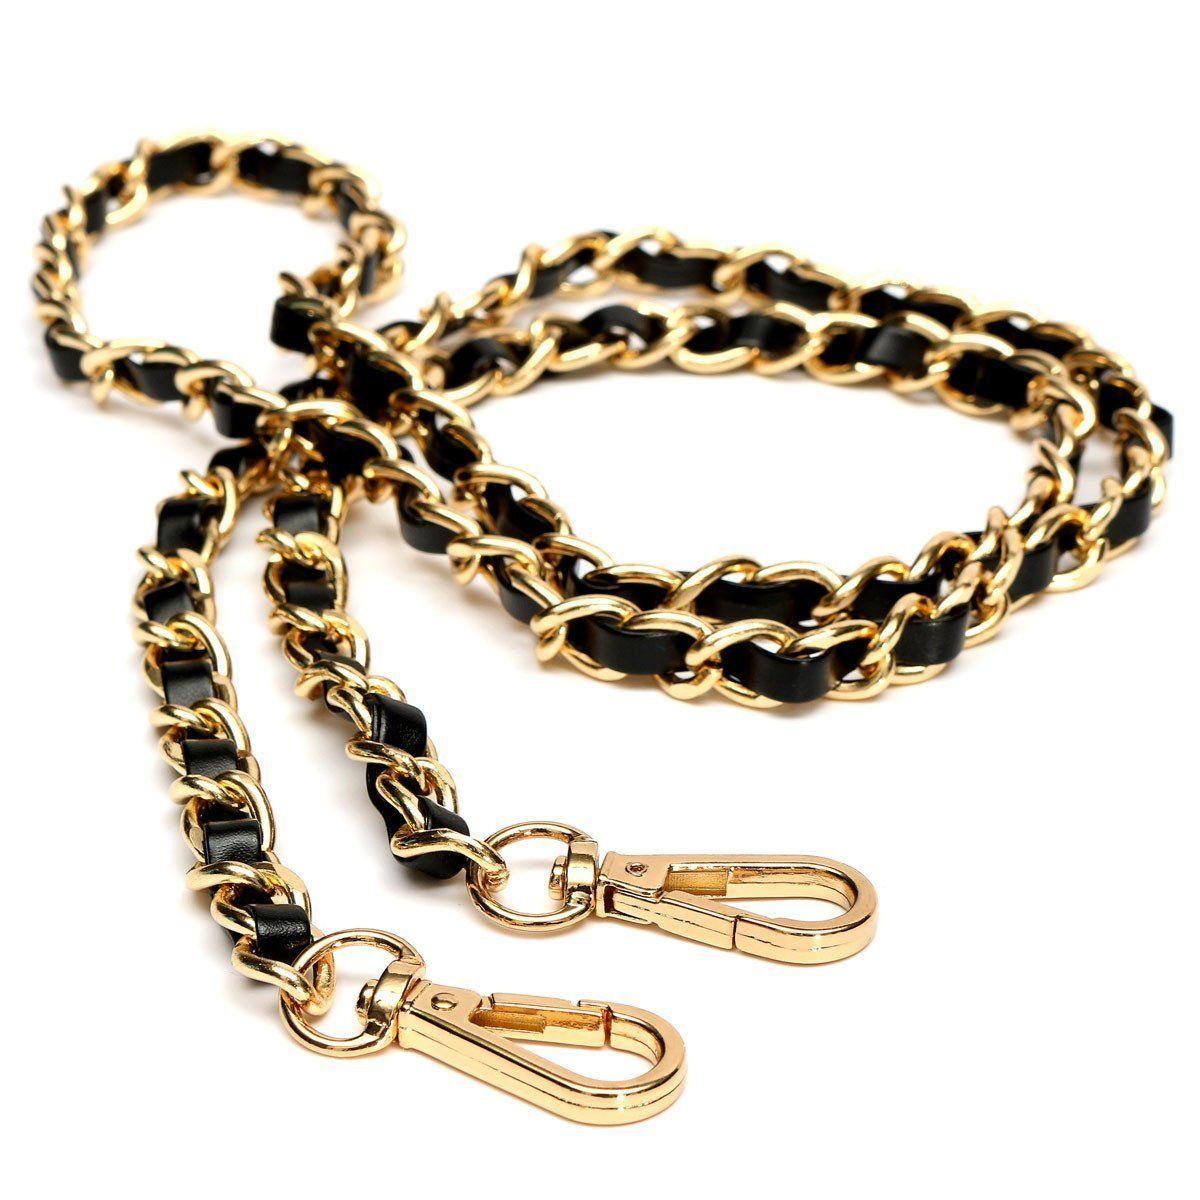 VSEN Hot Chain Purse Cross-body Handbag Shoulder Bag Strap Replacement Accessories Light gold + black120cm